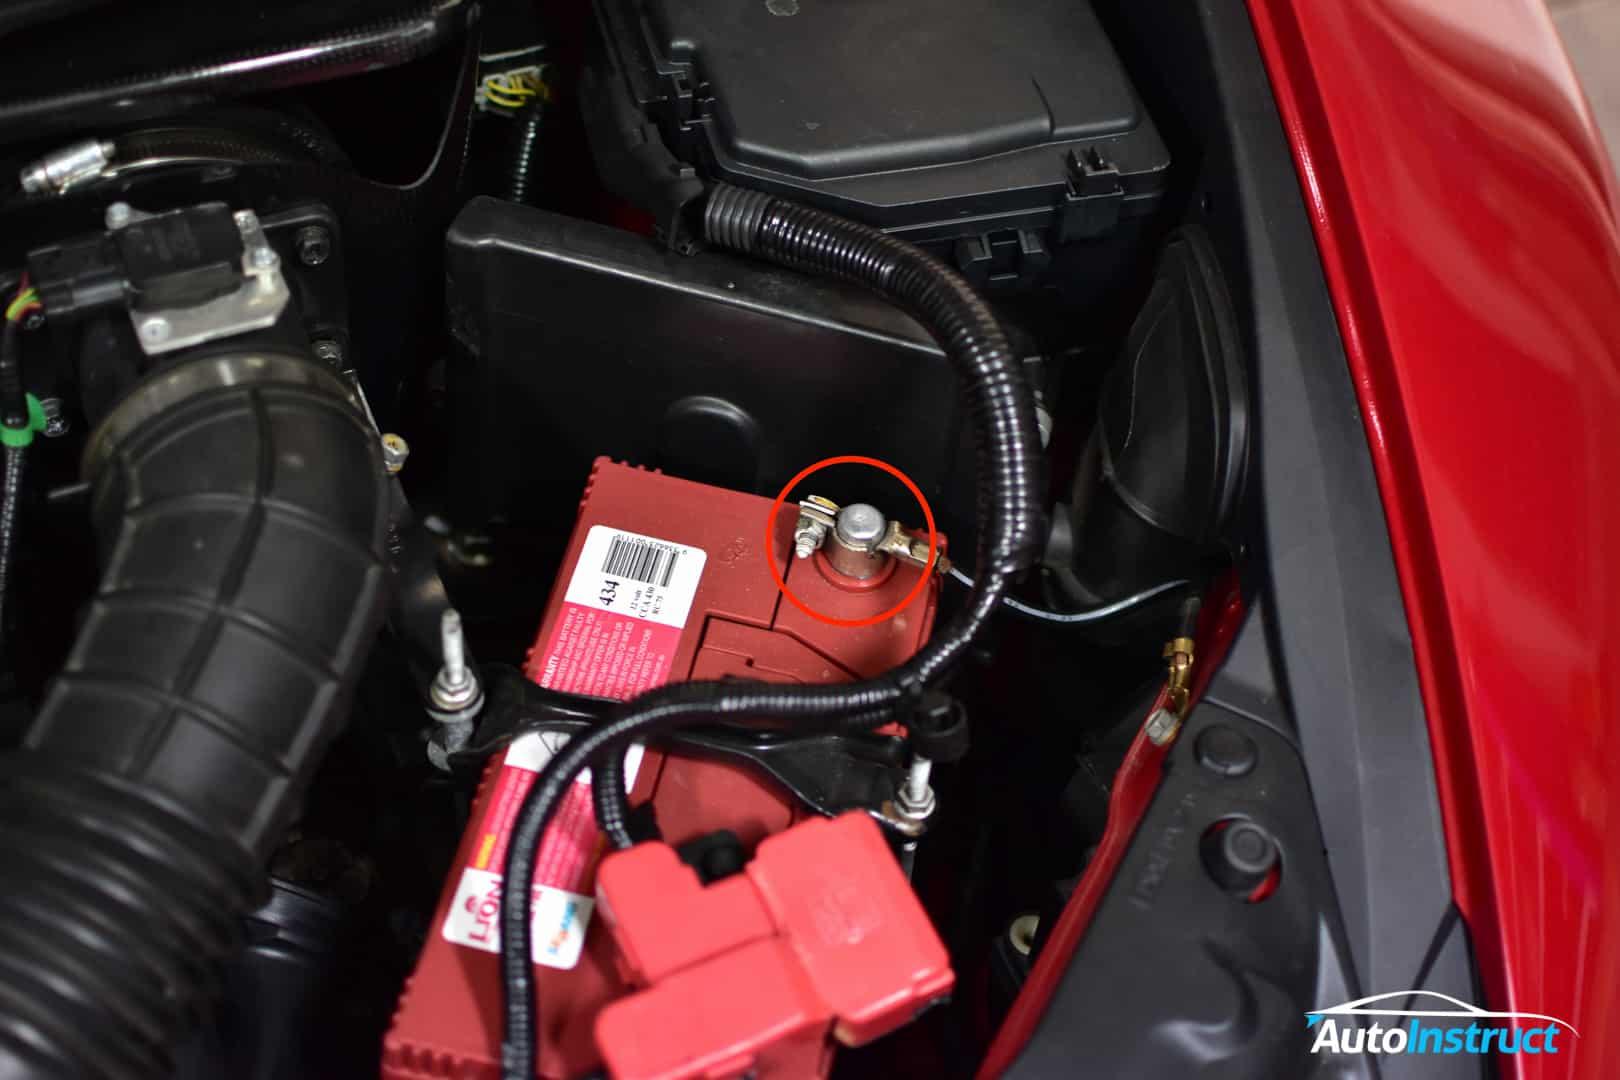 Honda Civic FN2 Steering Wheel Removal